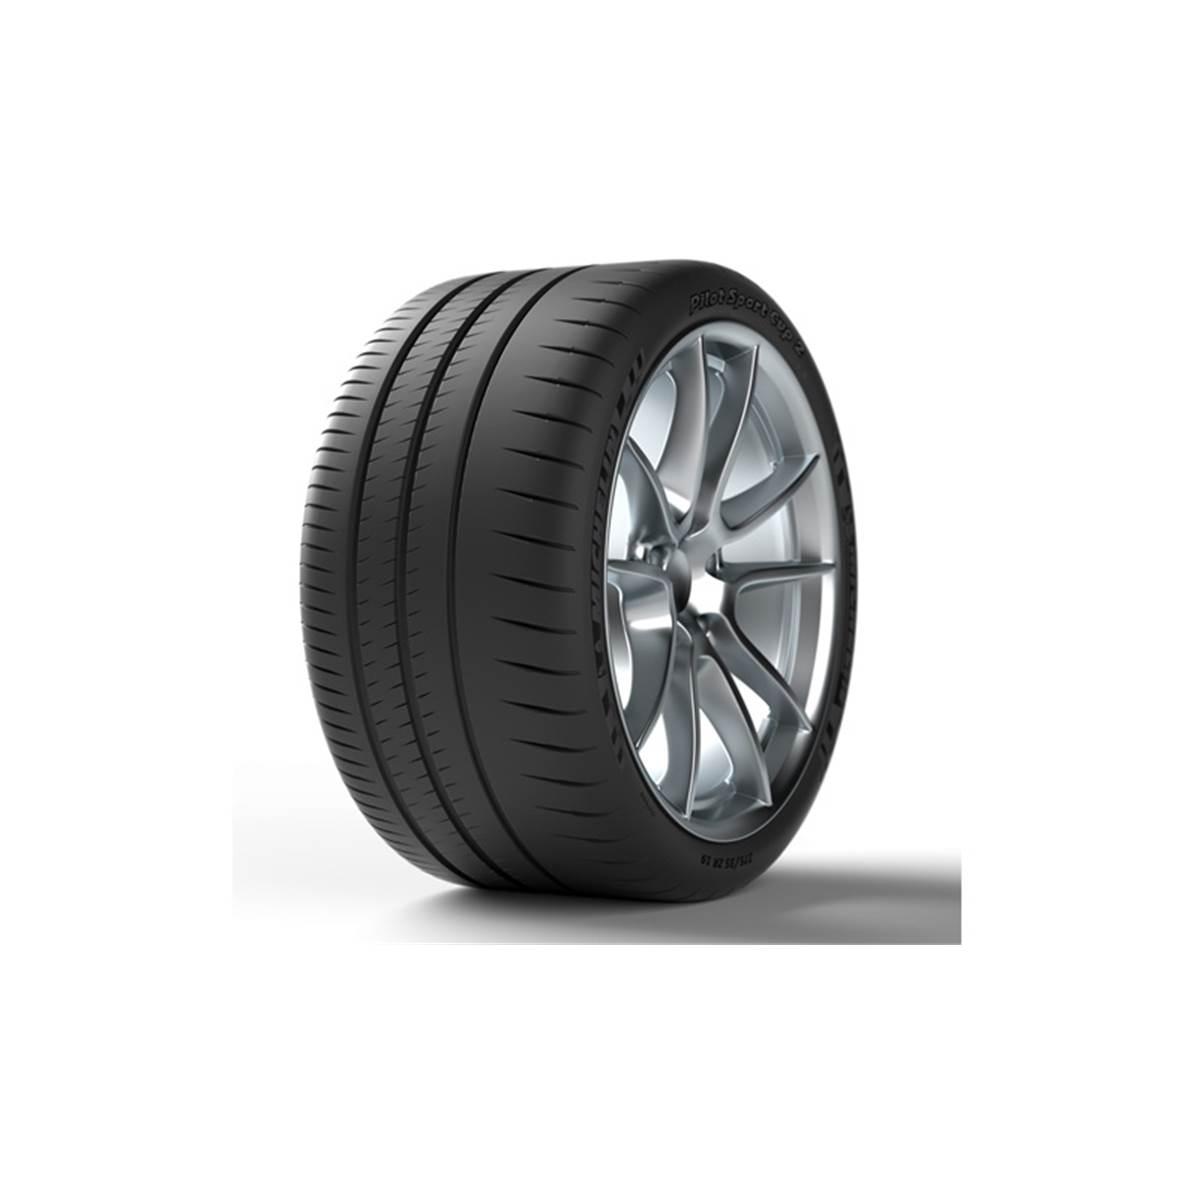 Pneu Michelin 255/35R19 96Y Pilot Sport Cup 2 XL